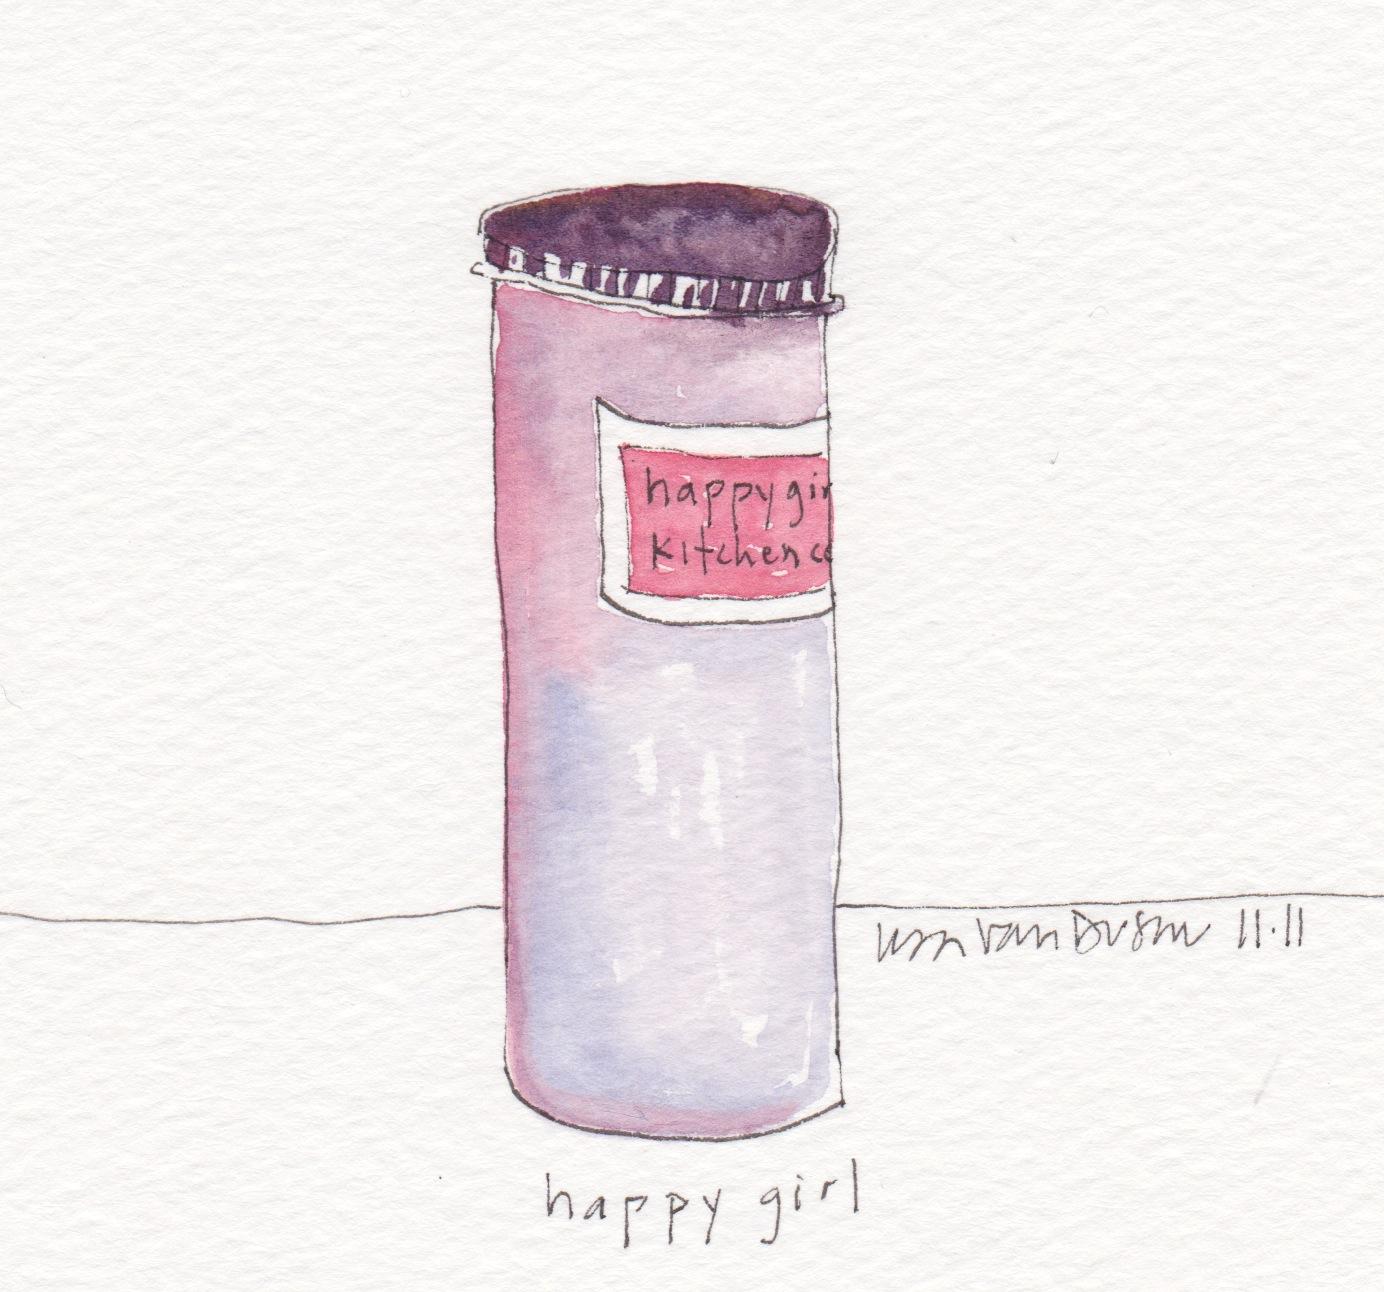 happy girl kitchen co. blackberry lemon summer jam 1.11 copy.jpeg